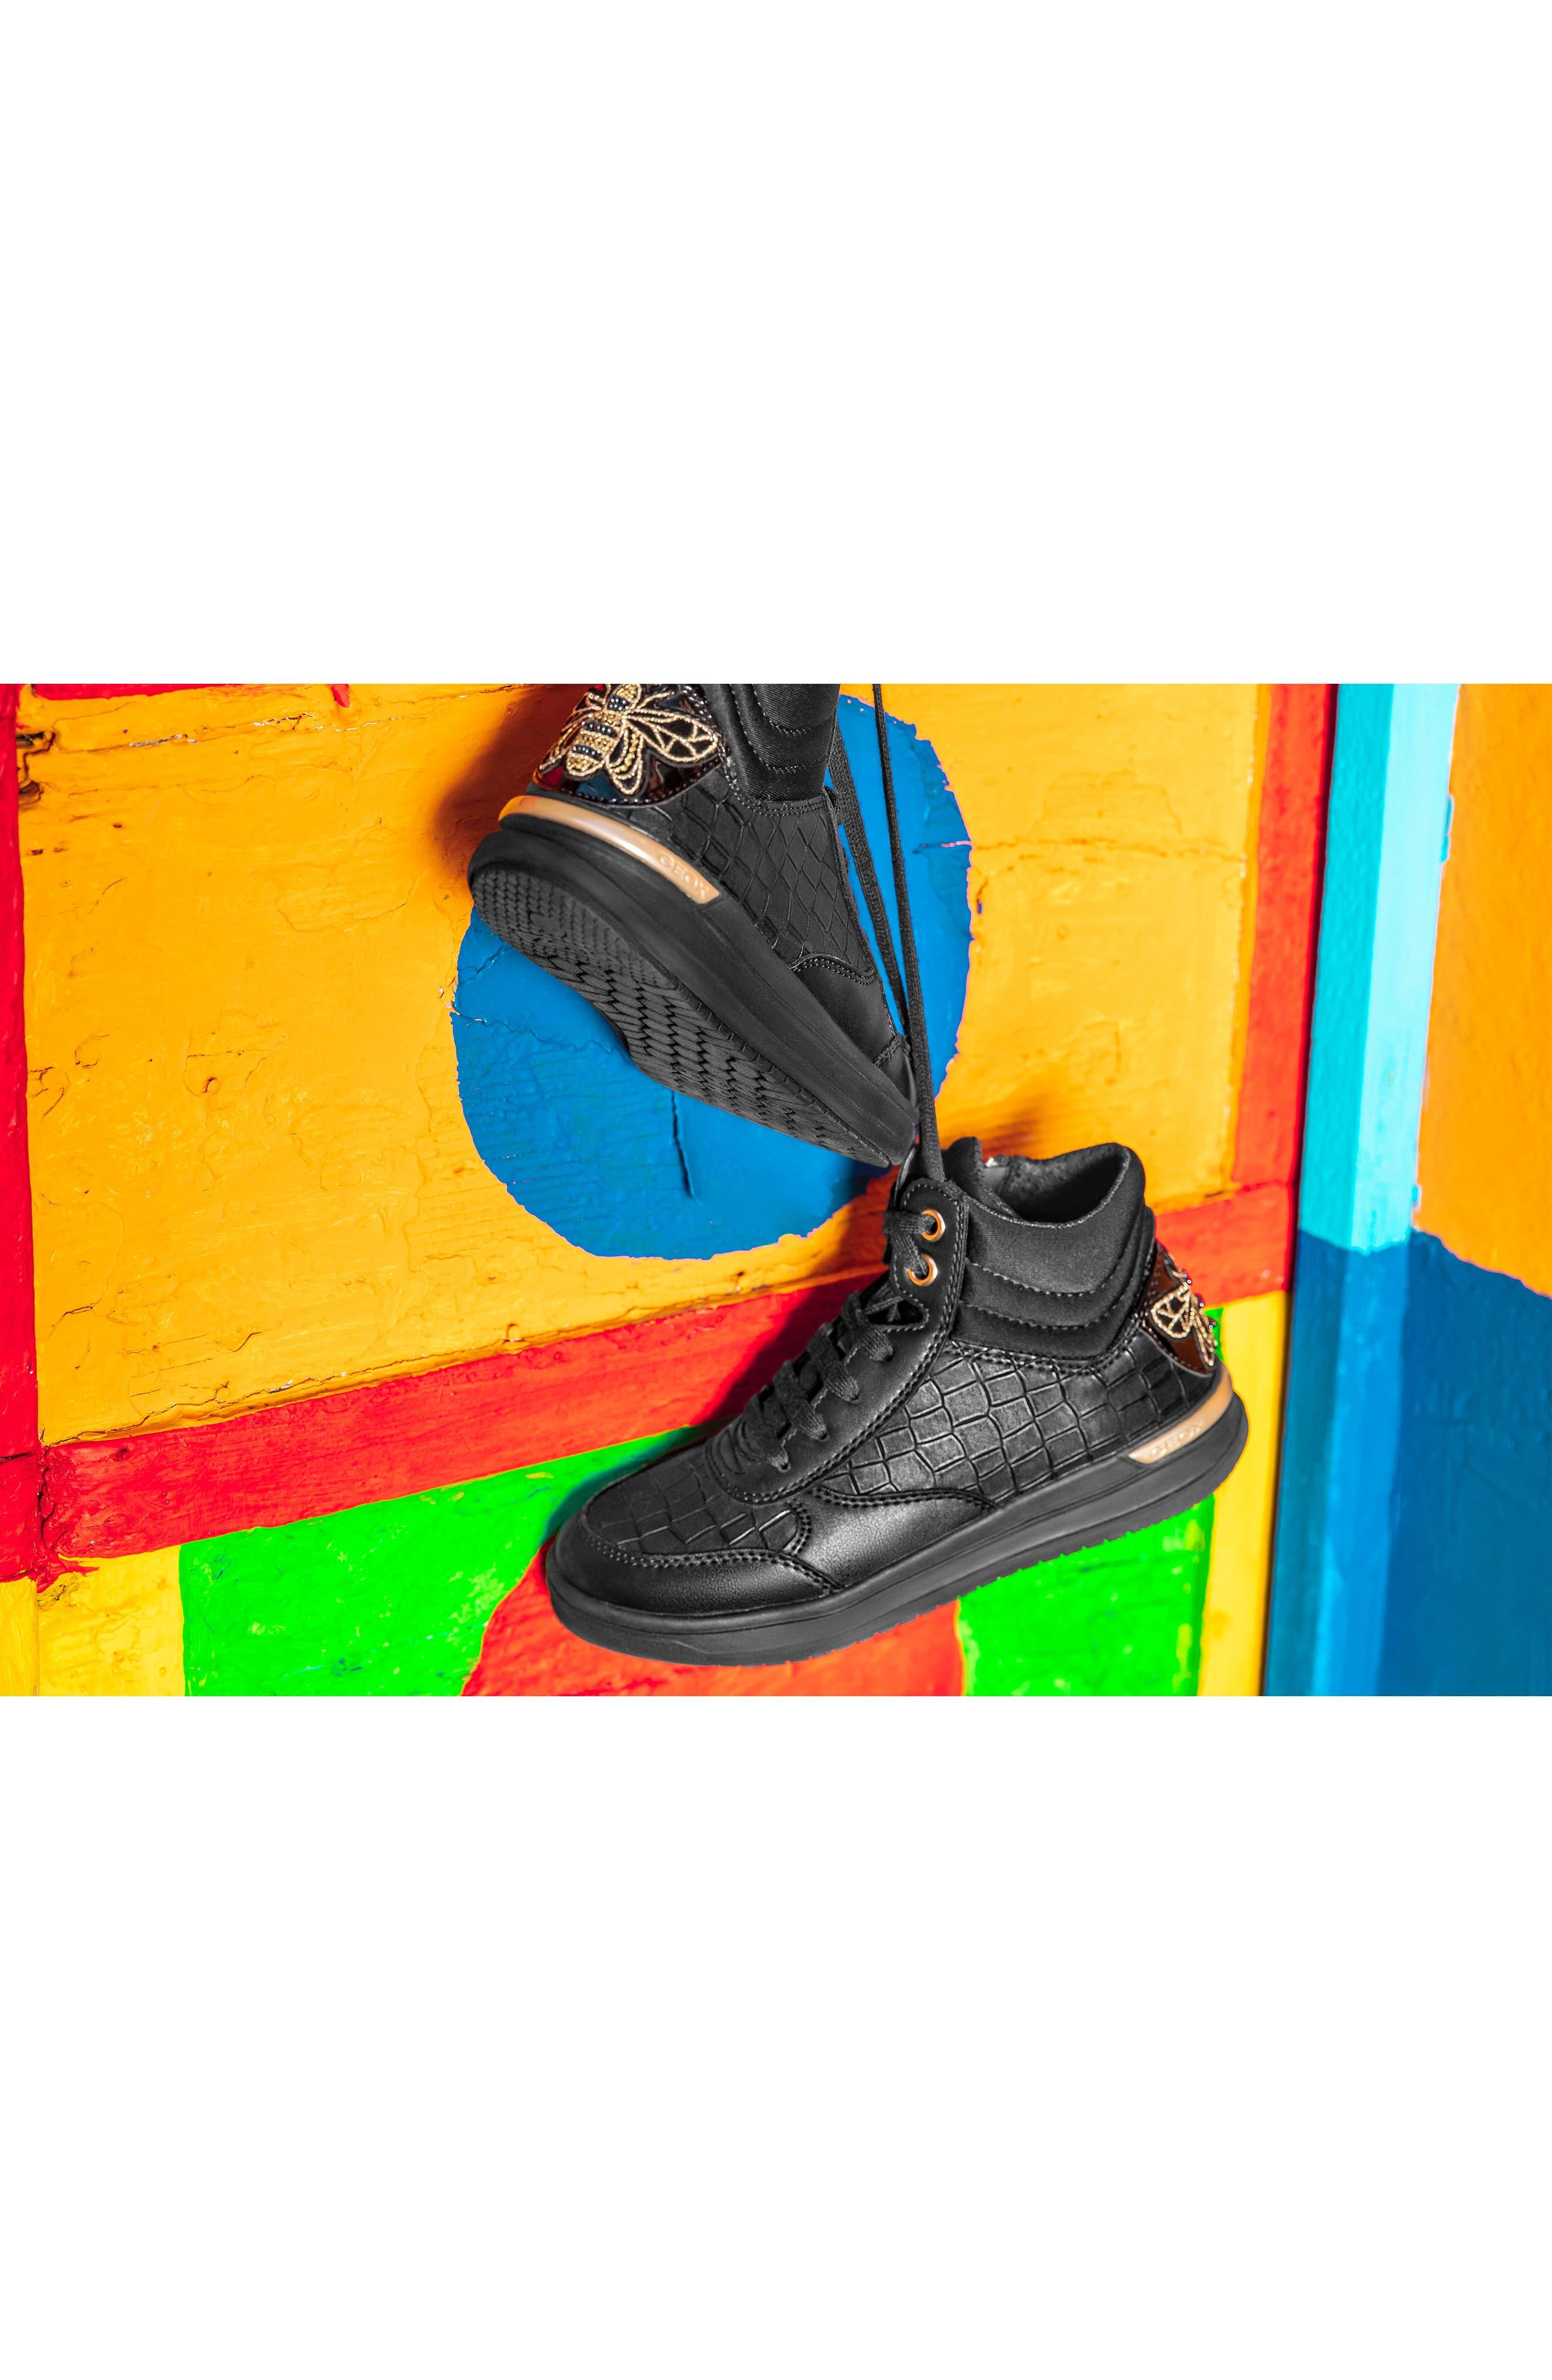 Aveup High Top Sneaker,                             Alternate thumbnail 7, color,                             BLACK